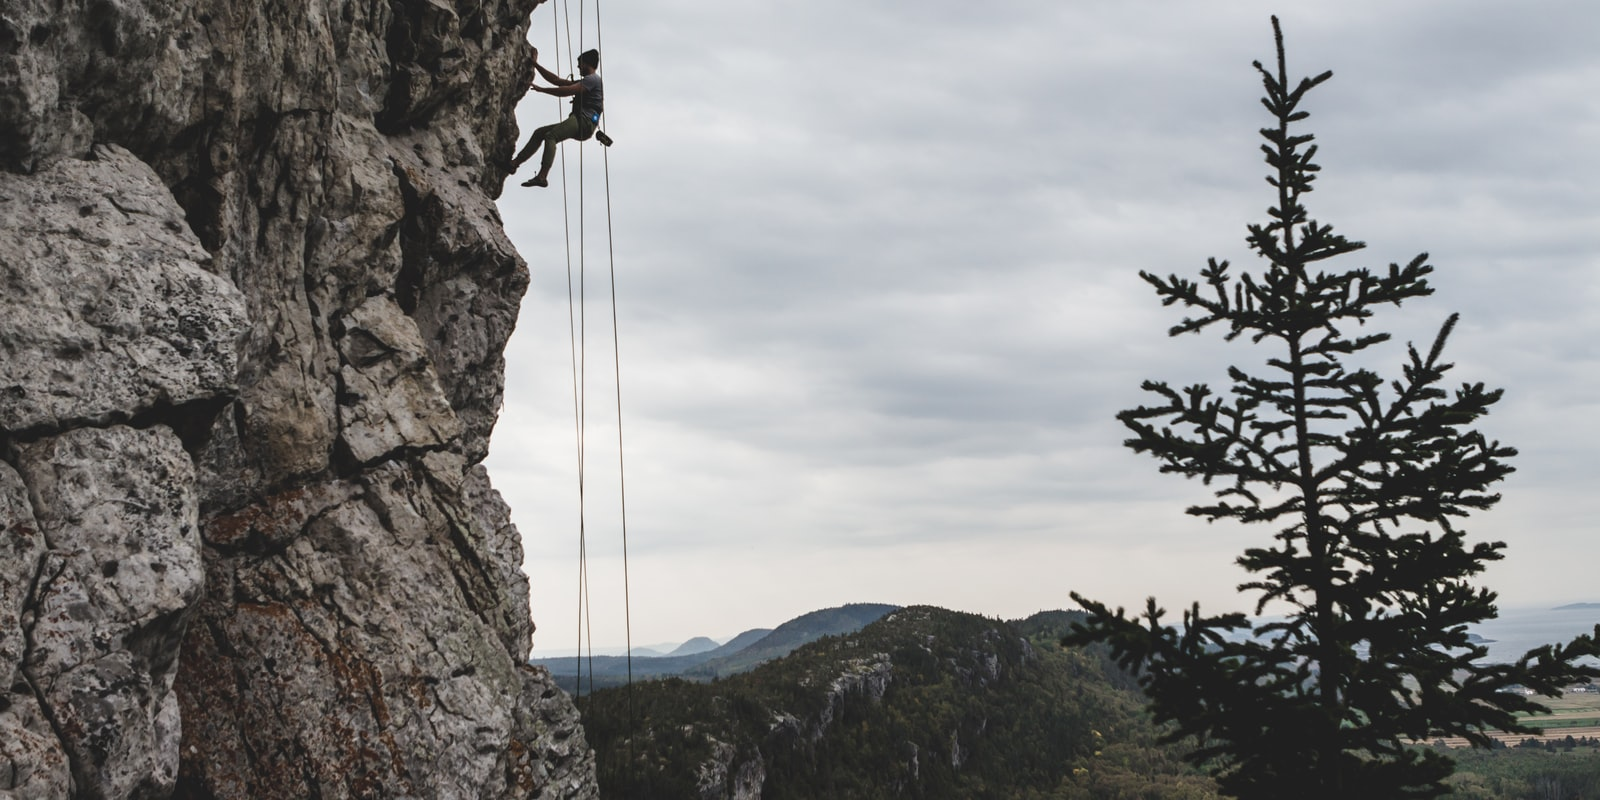 vertical-view-climbing-gym